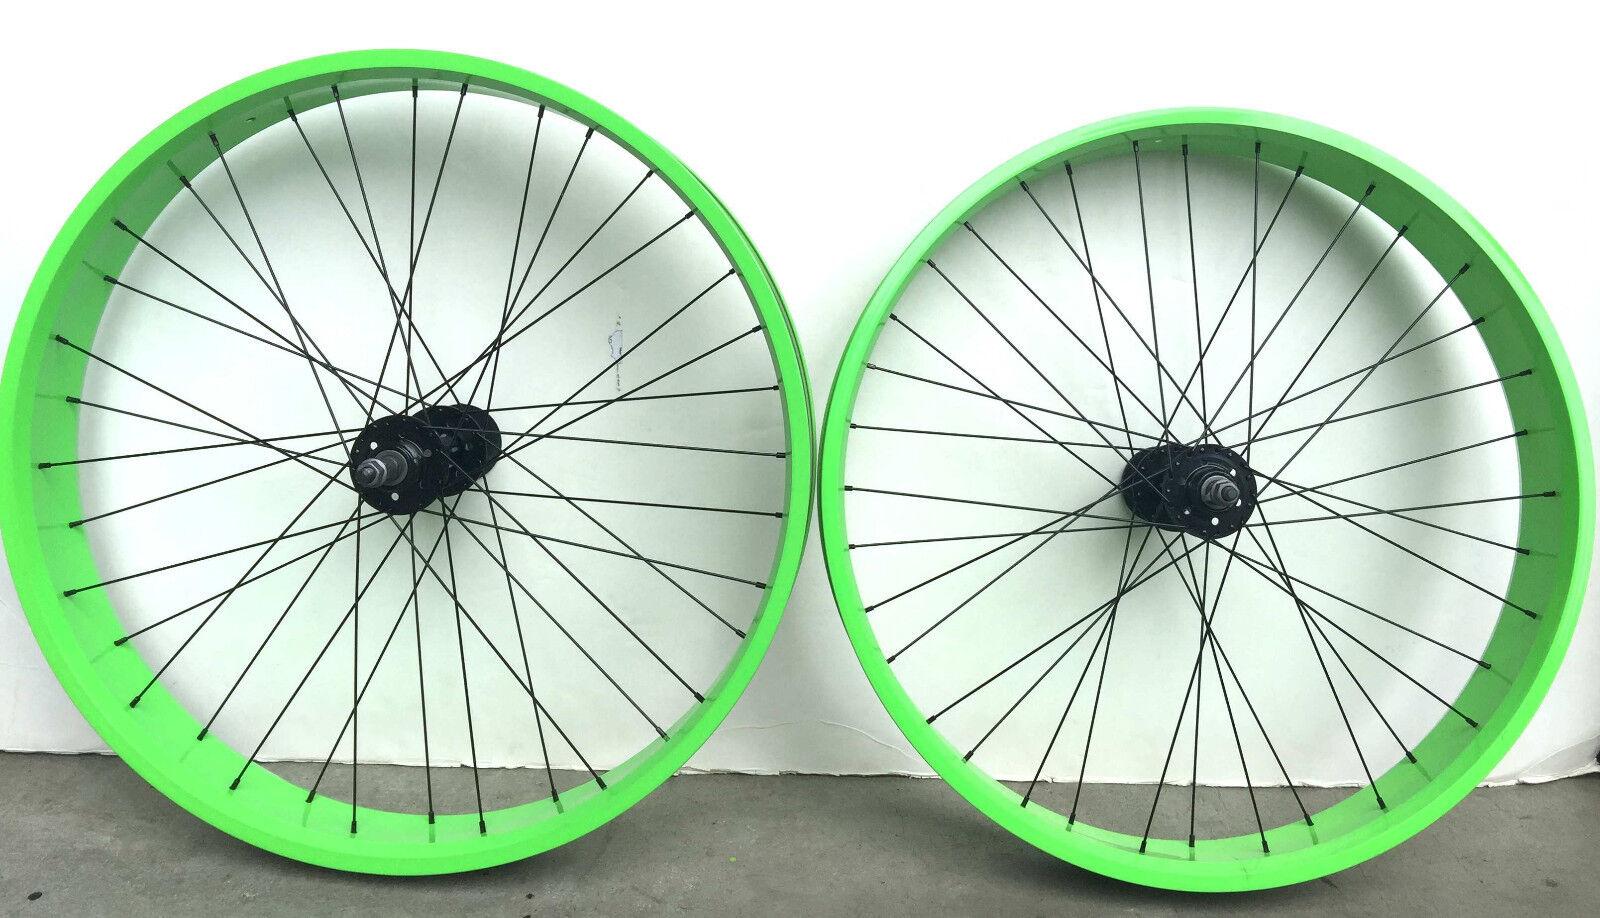 26  x 4.0 Rear & Front Fat Bike Wheels set 7 speed 36 spokes Disc Brake Grün